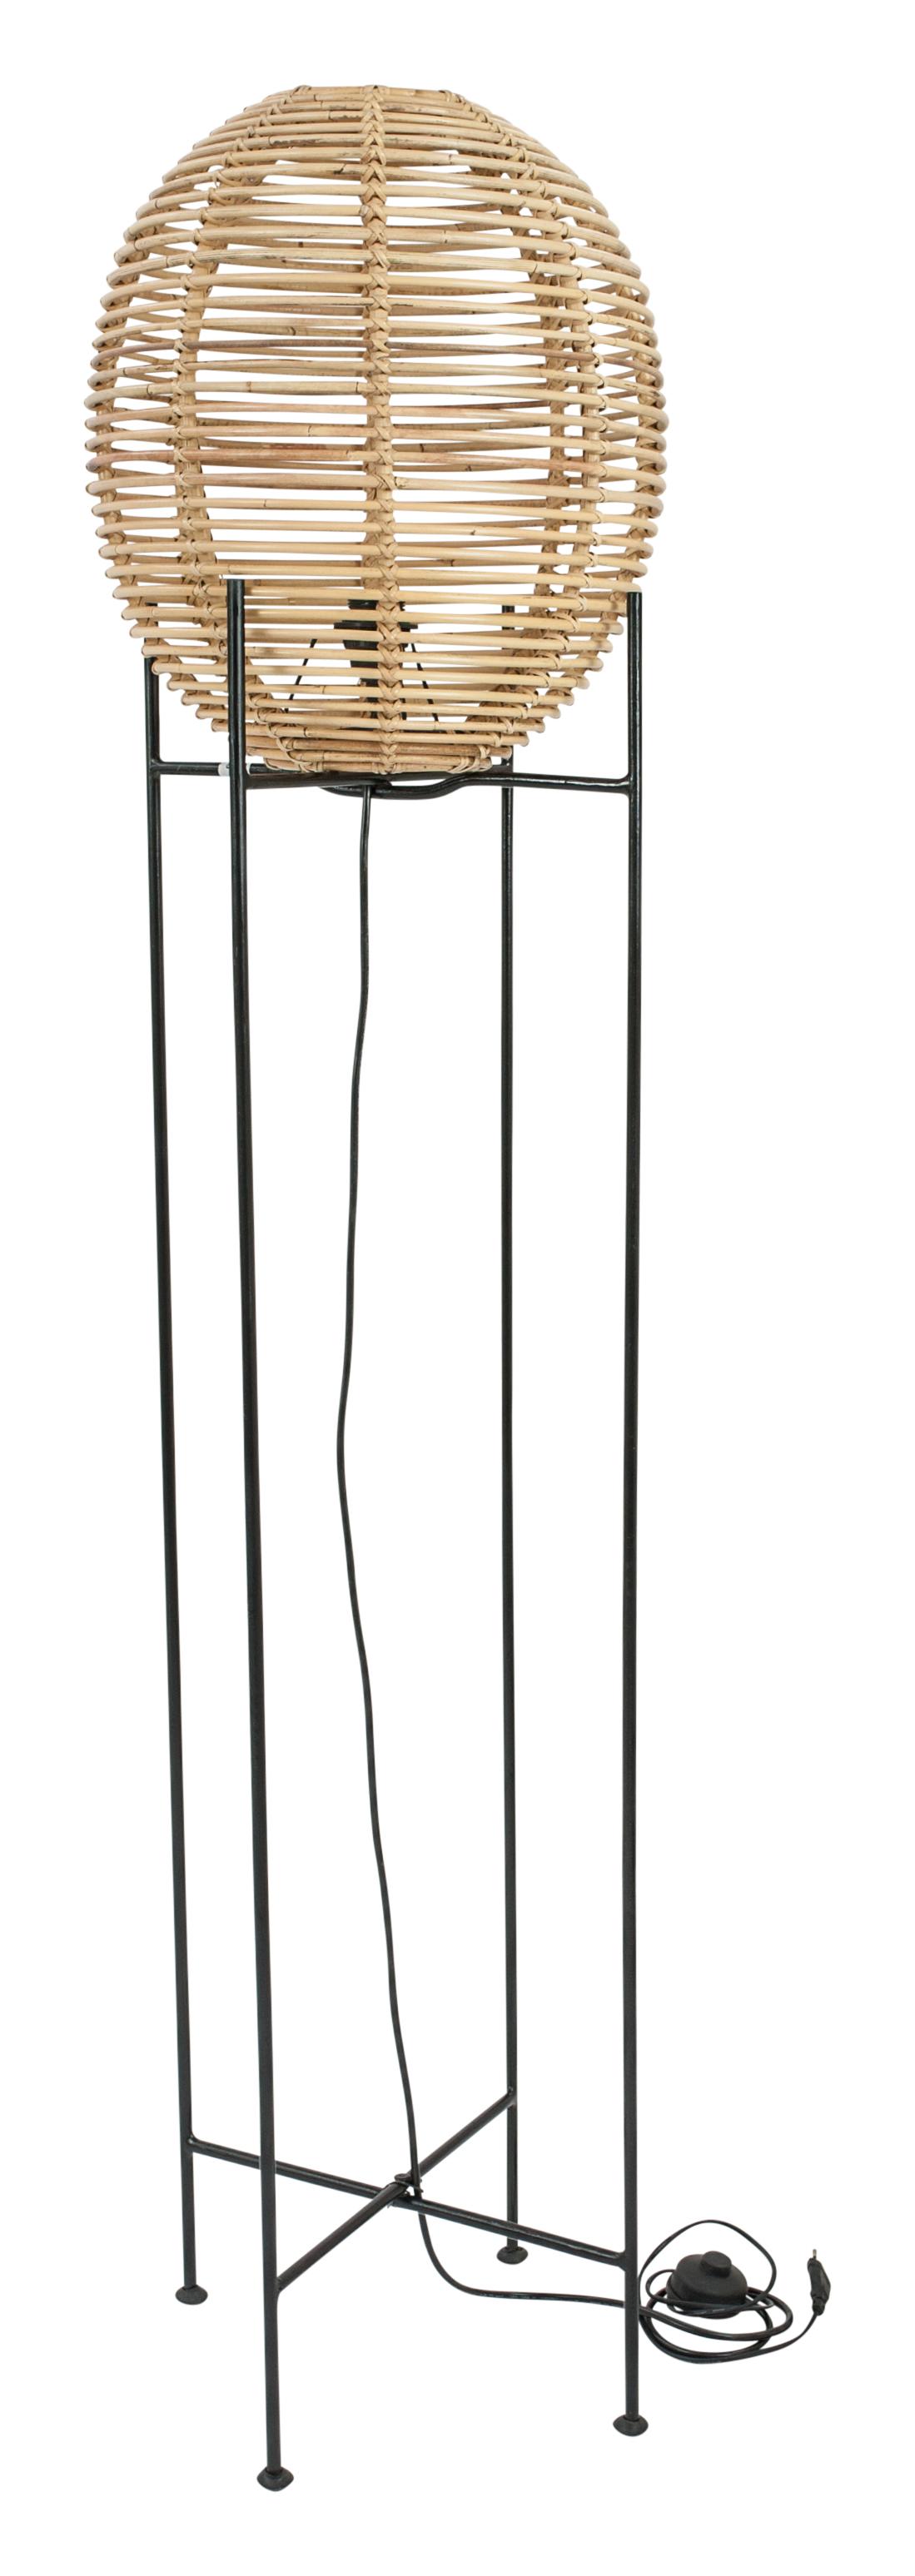 Rattan-Stehlampe Large